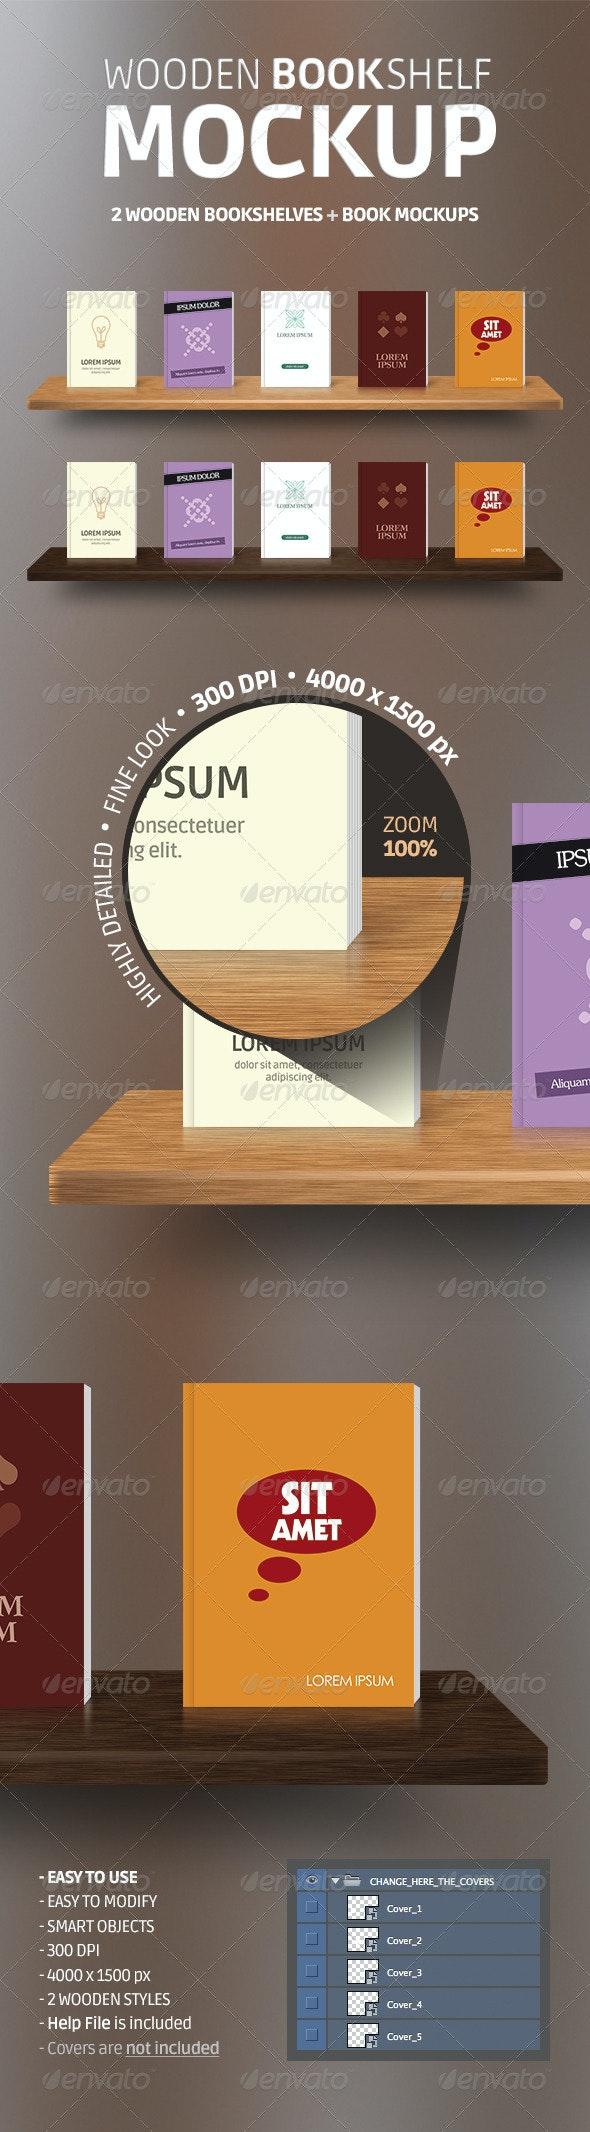 Wooden Bookshelves + Book Mockup PSD - Product Mock-Ups Graphics